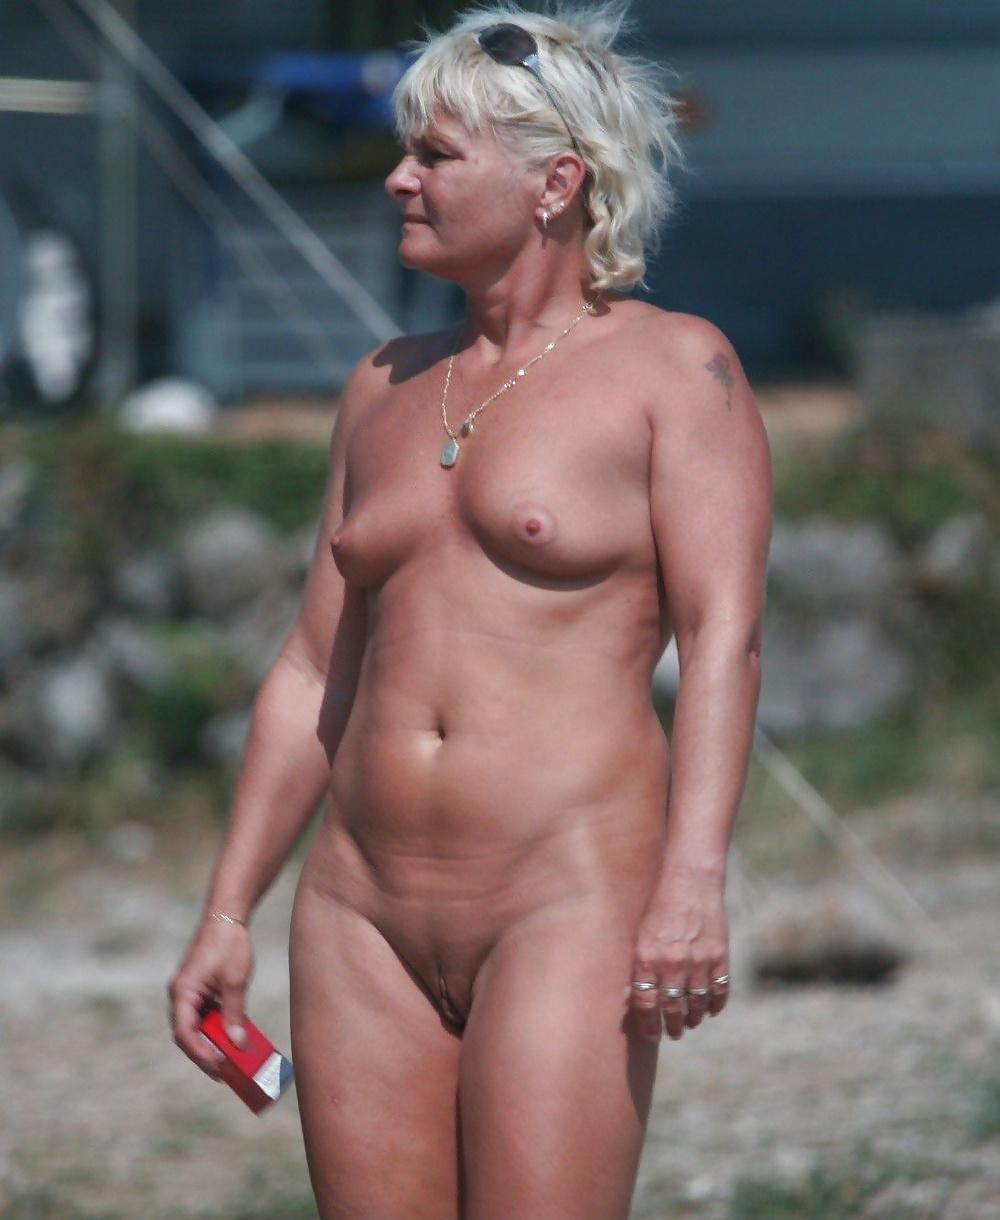 Mature women pooping shitting compilation pics